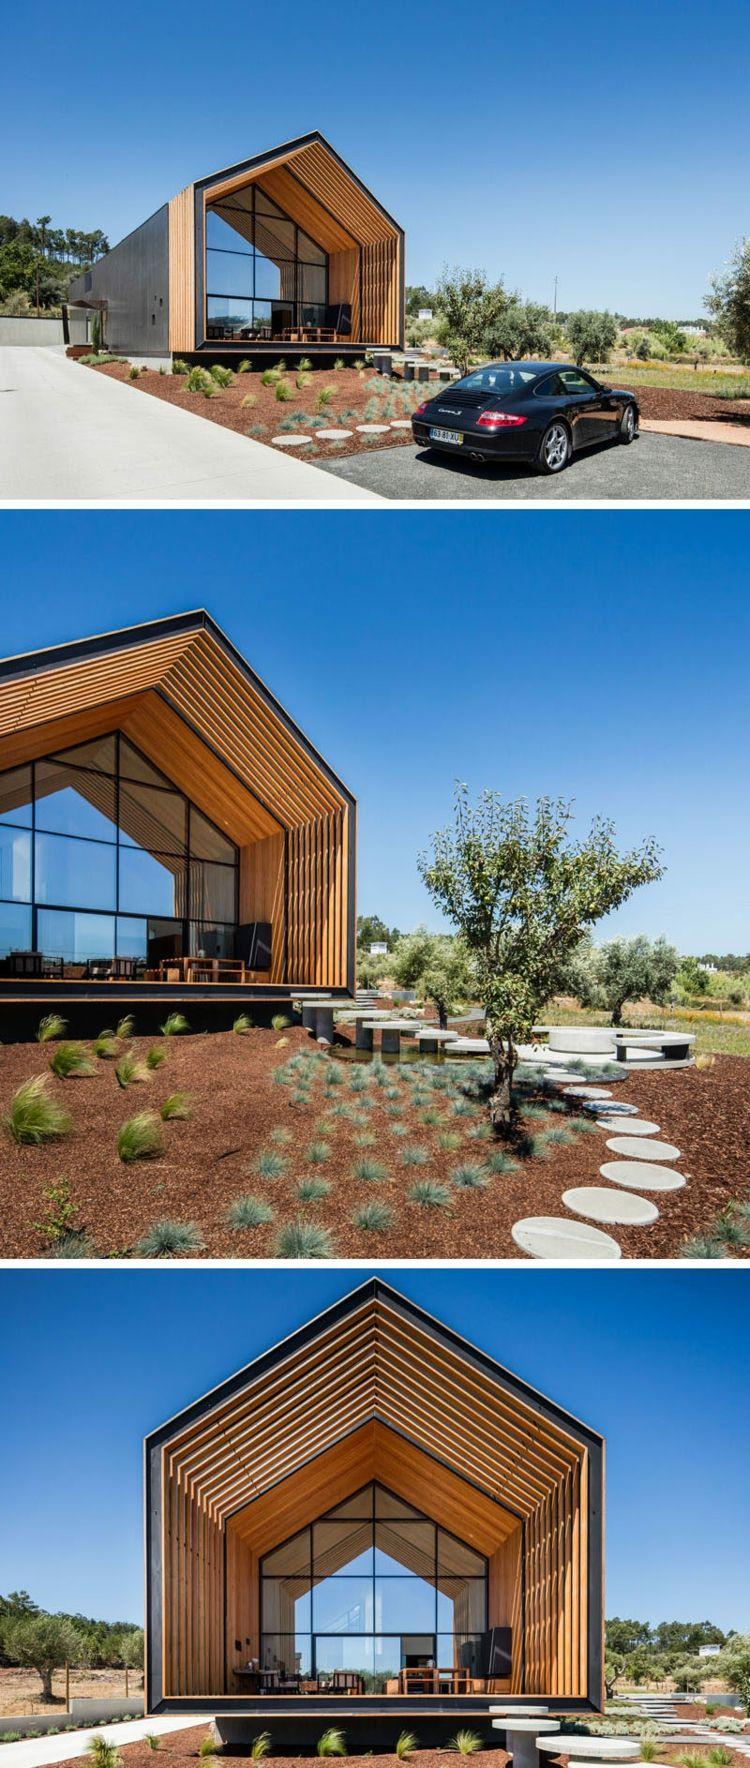 form haus schwarzer beton holz veranda aus holz garten future infections in 2018 pinterest. Black Bedroom Furniture Sets. Home Design Ideas